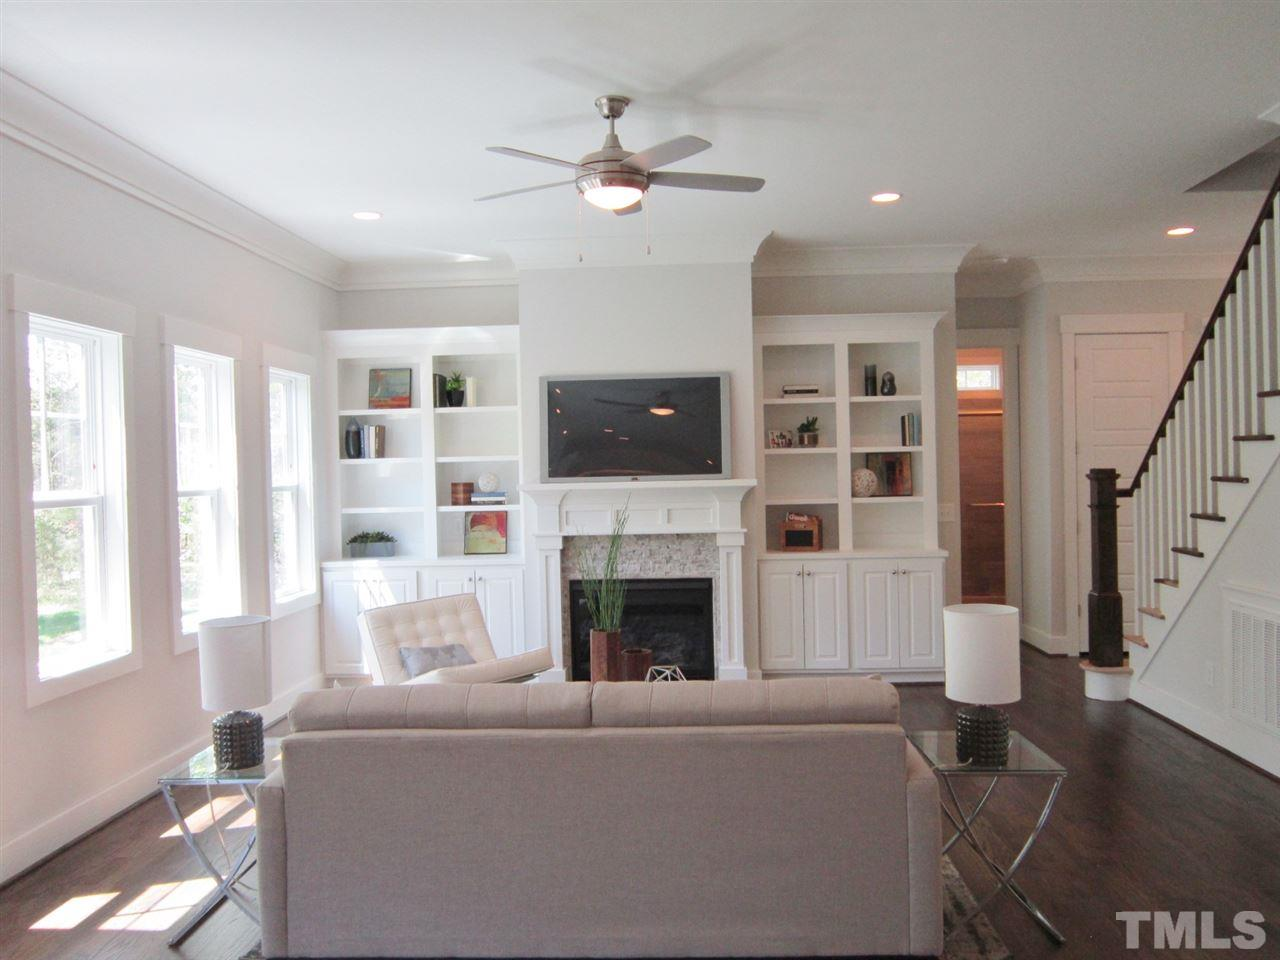 Home interior design raleigh - Living Room Home Interior Design Raleigh Nc Sweet T Designer